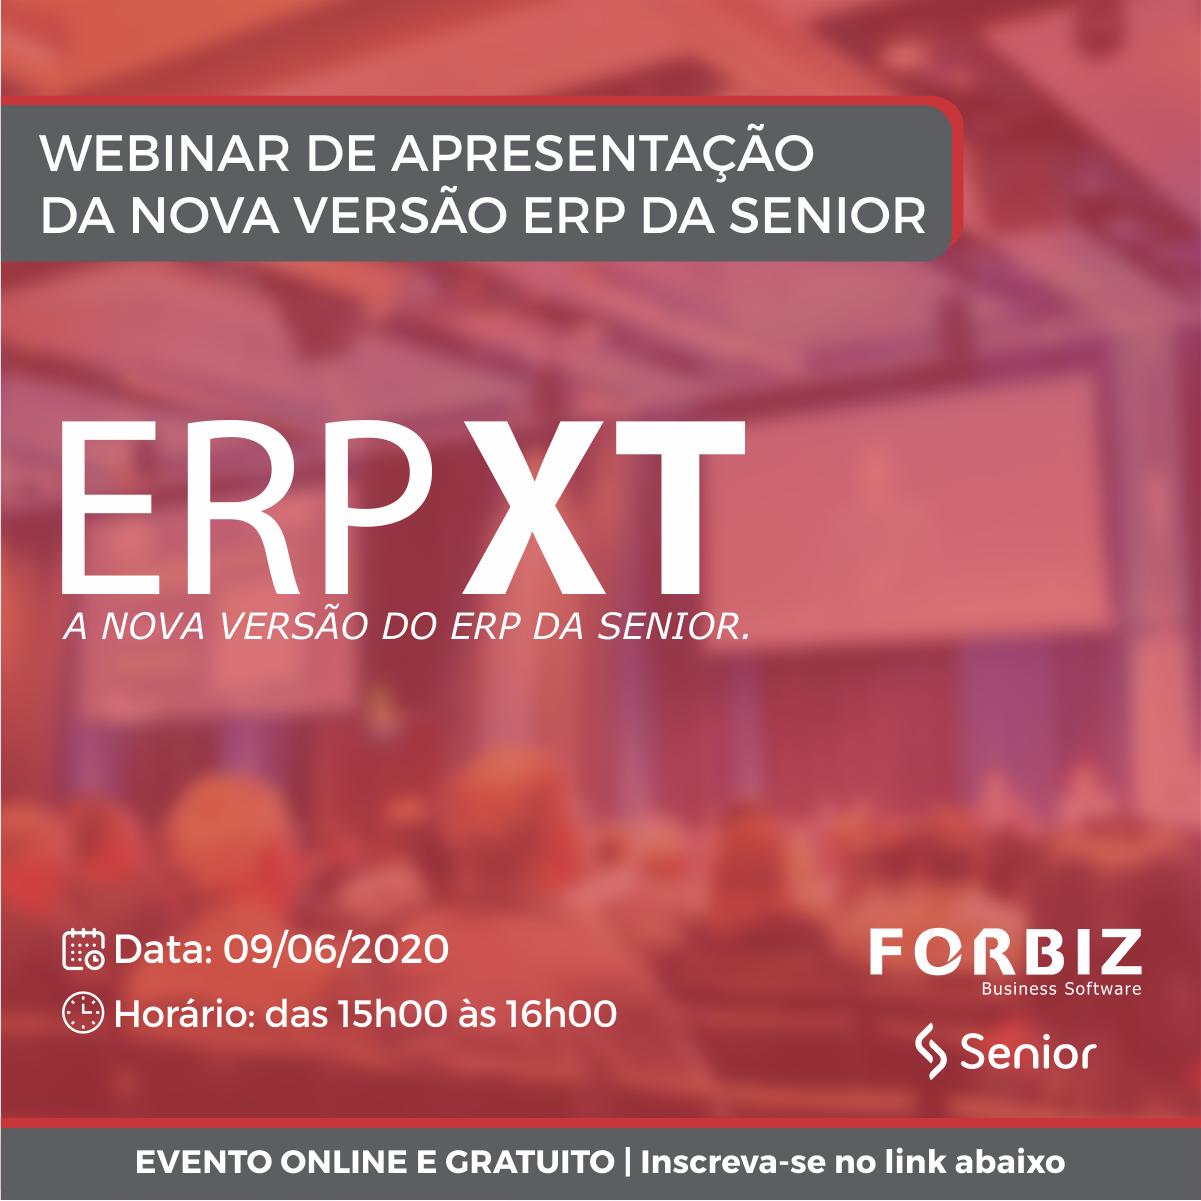 WEBINAR ERP XT nova versão do ERP da Senior